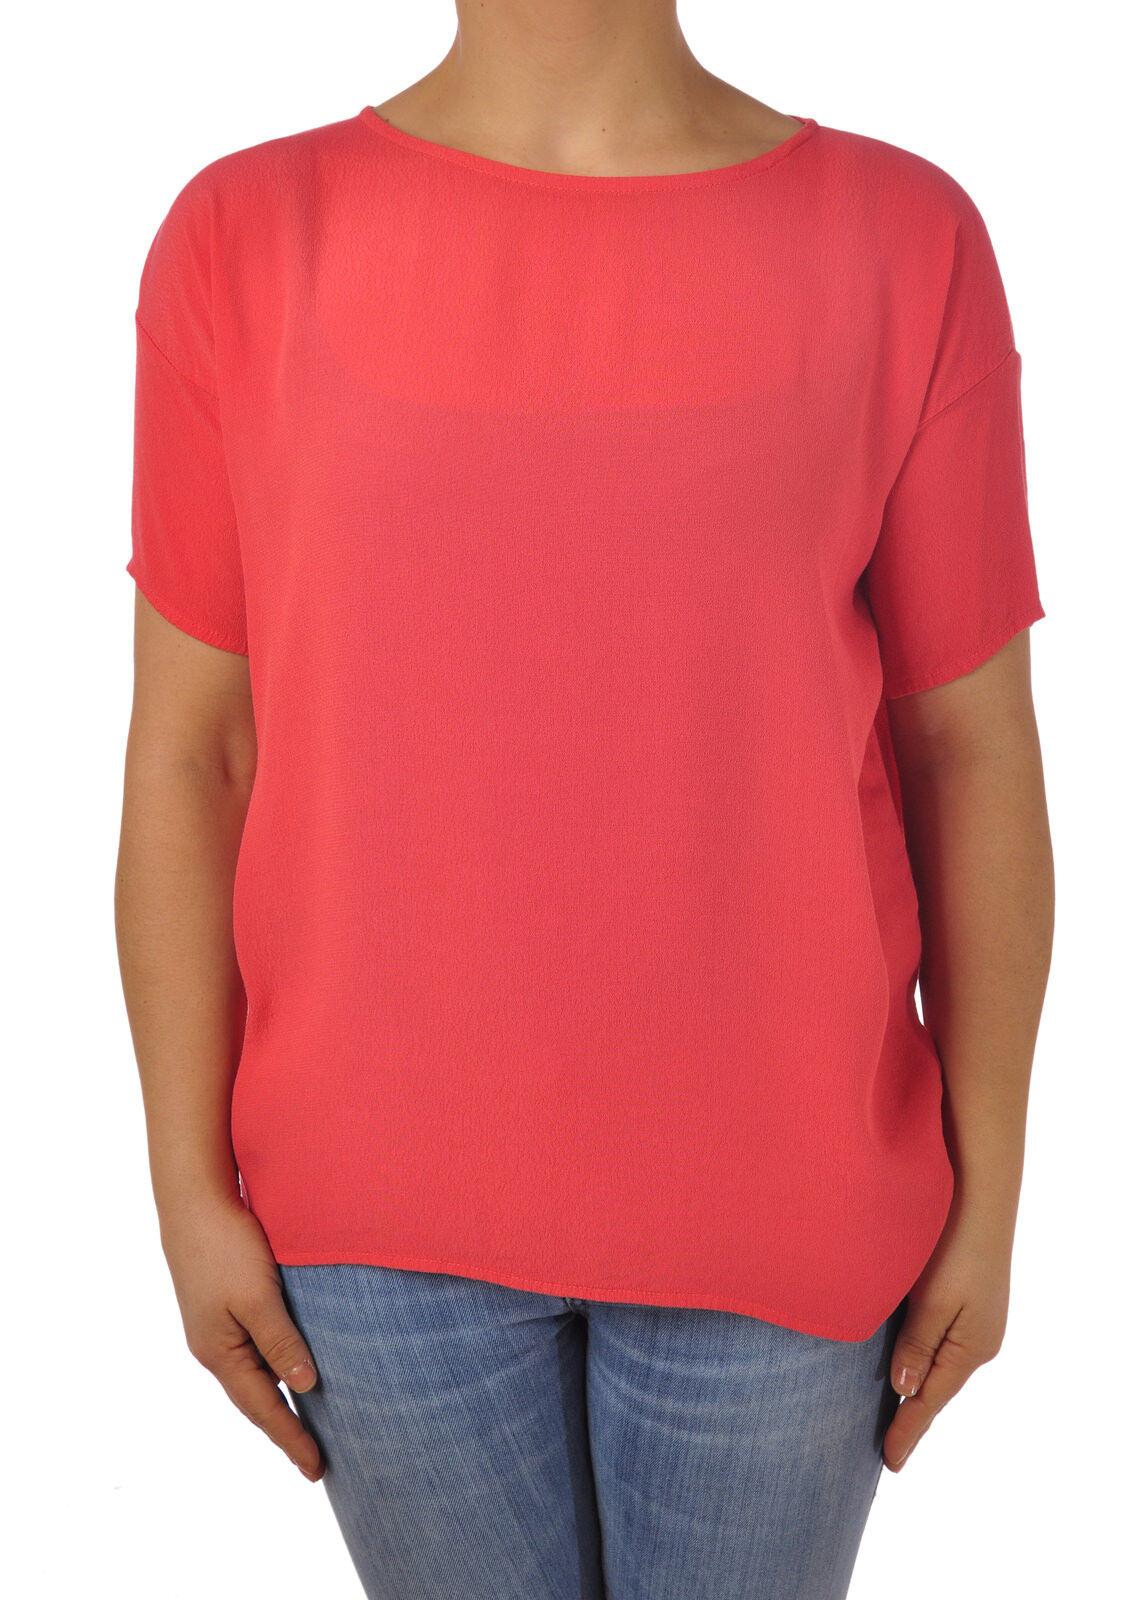 CROSSLEY - Camicie-Blause - damen - Rosa - 5087412F184053